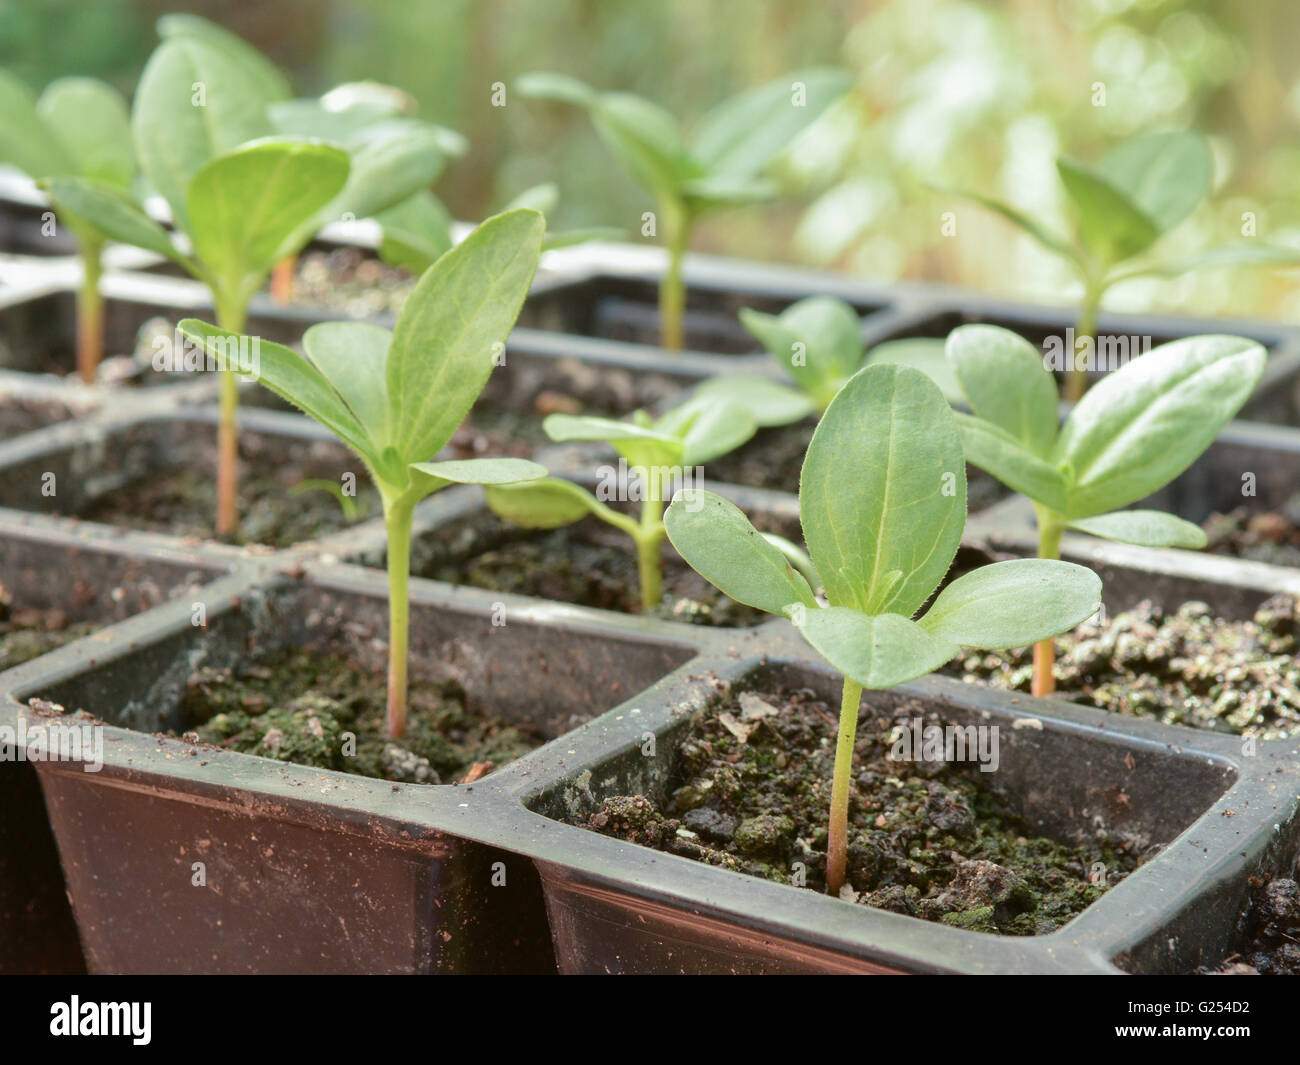 seedlings in plastic modular tray - Stock Image